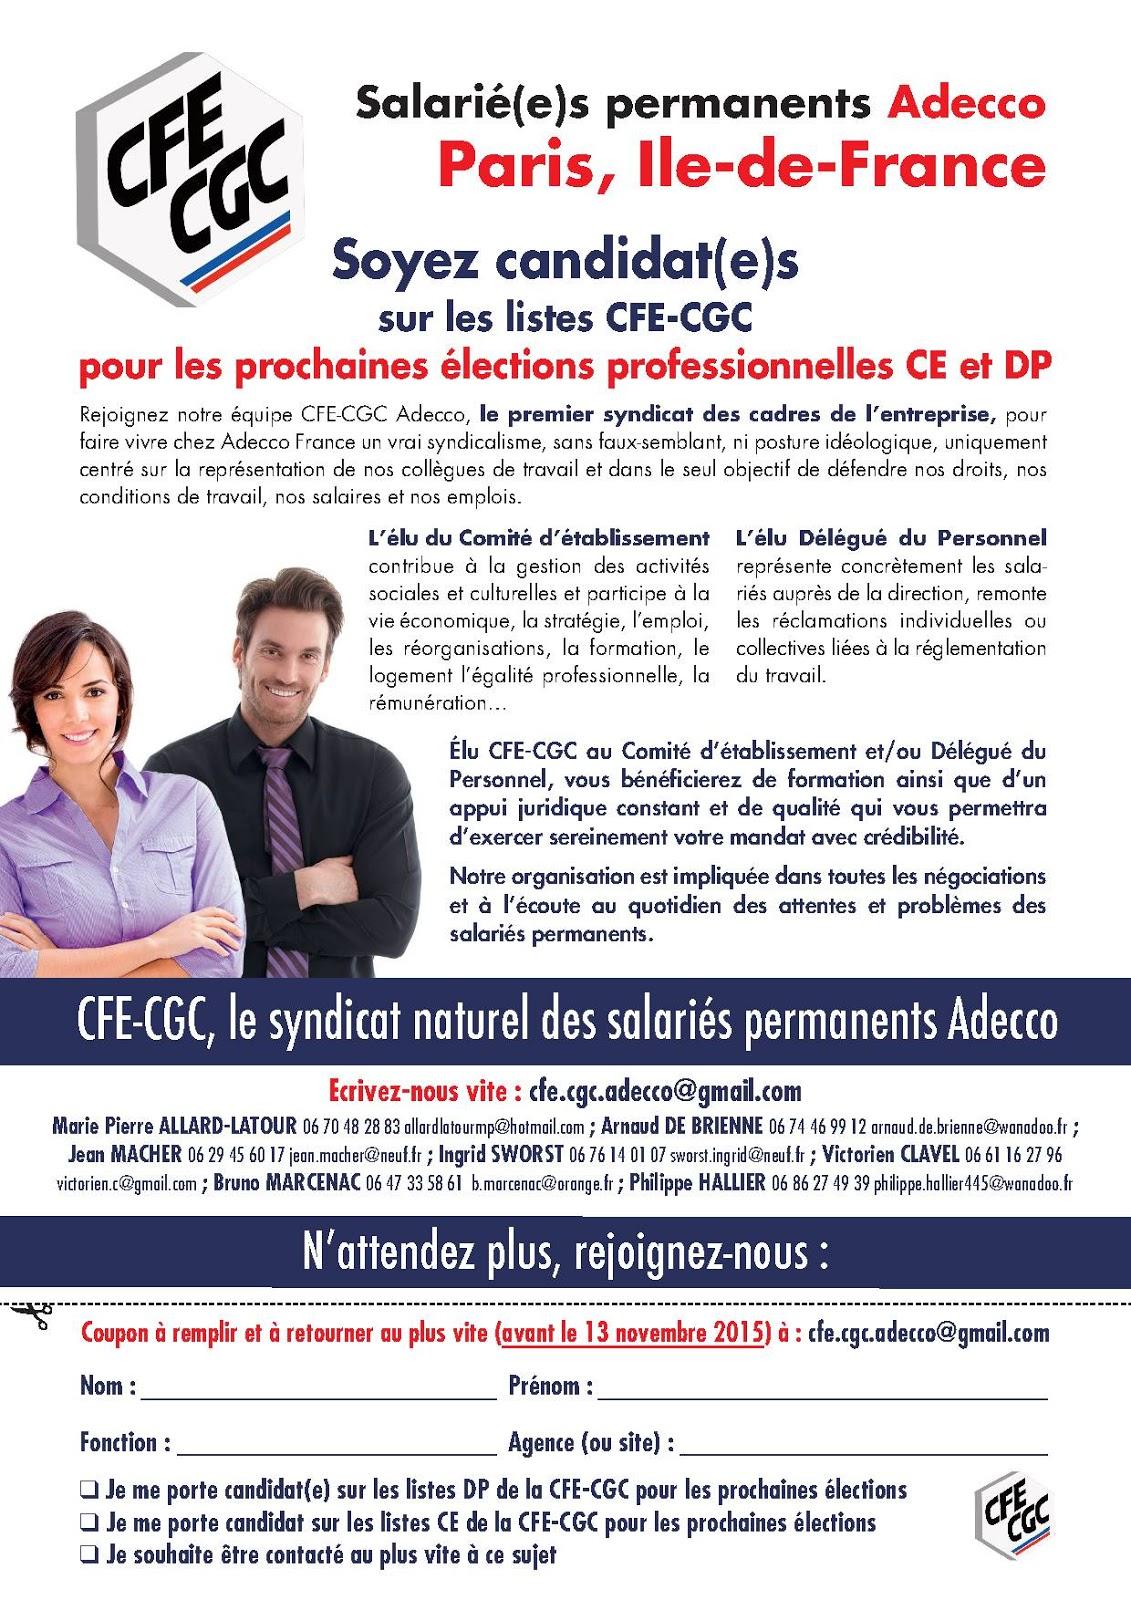 CFE-CGC Adecco: Salarié(e)s permanents Adecco, Paris, Ile ...